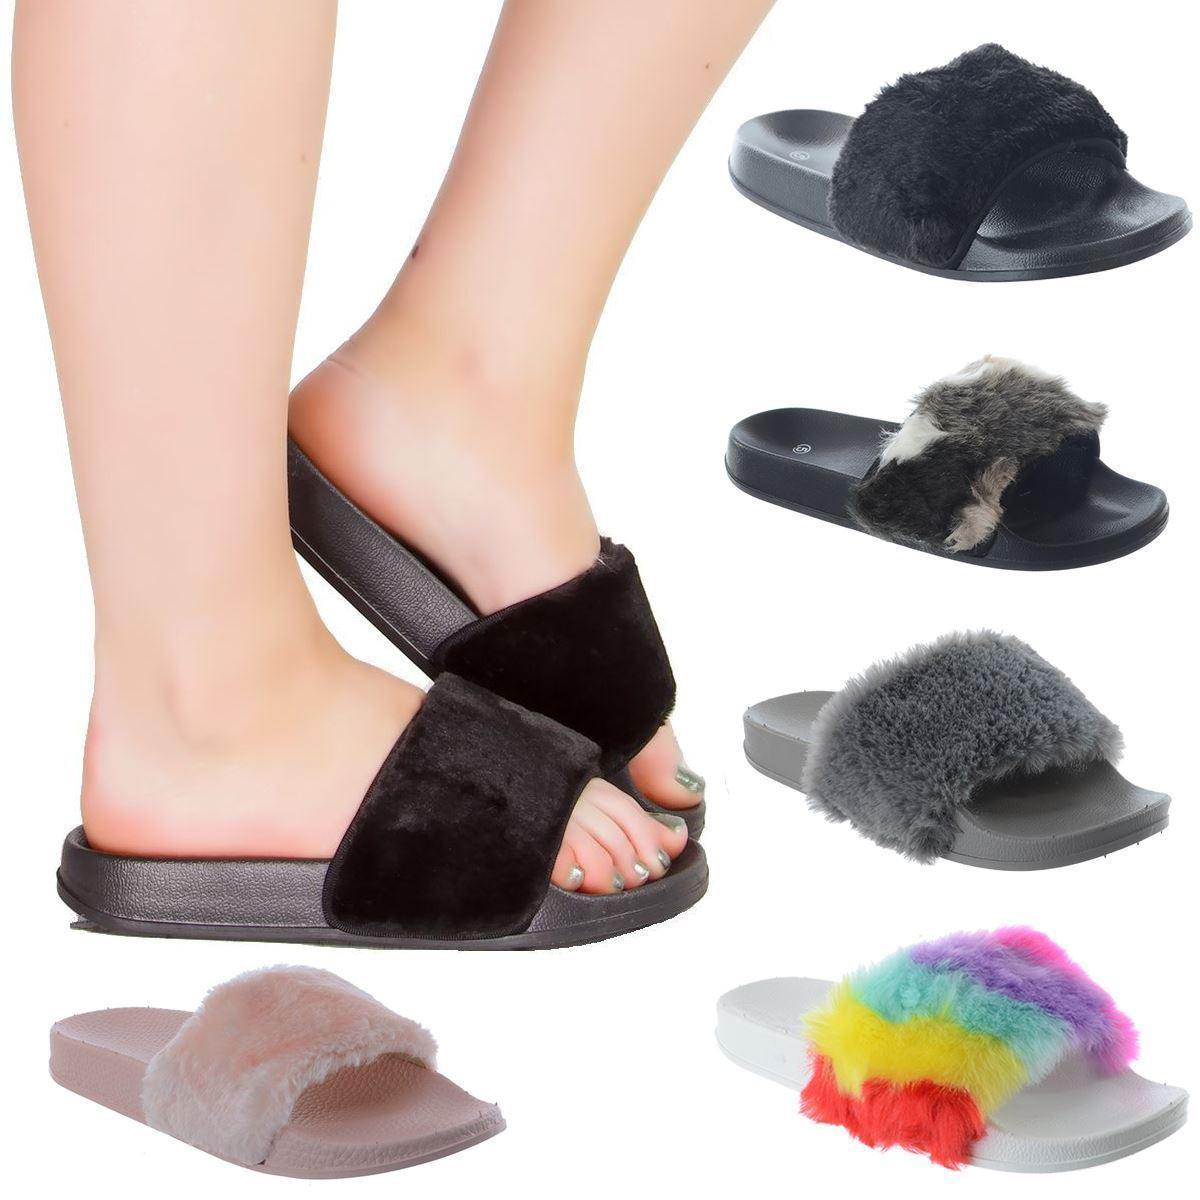 NEW WOMENS LADIES FLAT CELEB SLIP SANDALS ON FUR TRIM SLIDES SANDALS SLIP SHOES SLIPPERS SIZE 8ed208